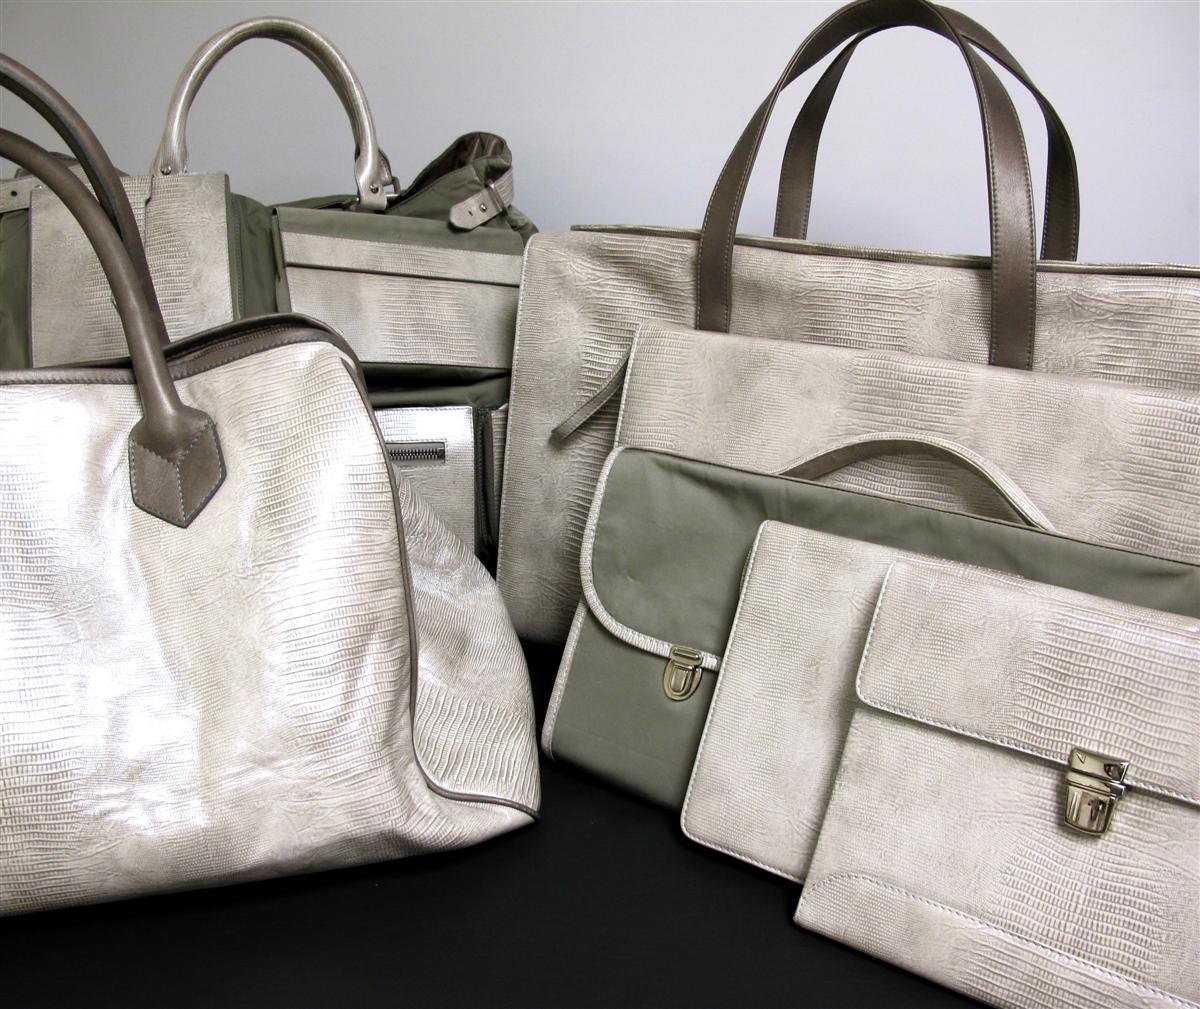 custom designer handbags and accessories townsend leather. Black Bedroom Furniture Sets. Home Design Ideas